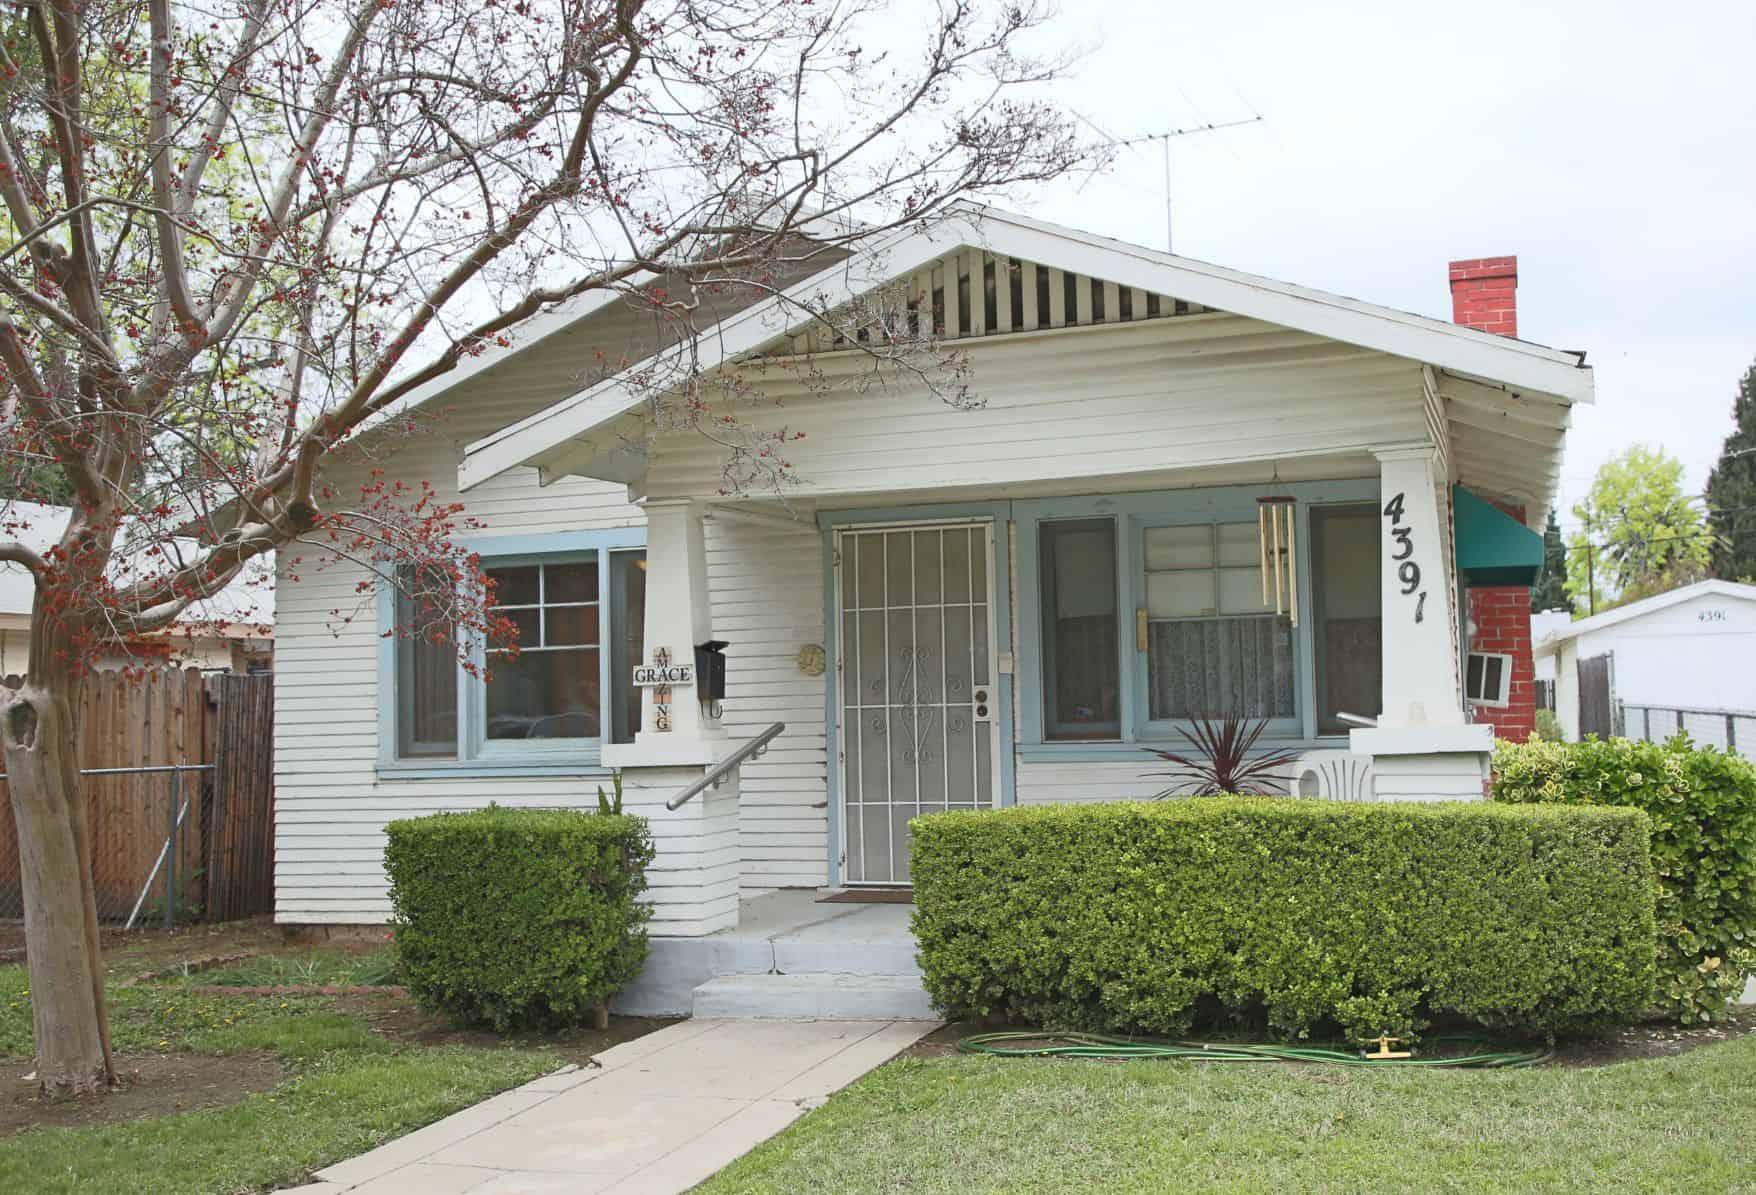 4391 Edgewood Pl., Riverside